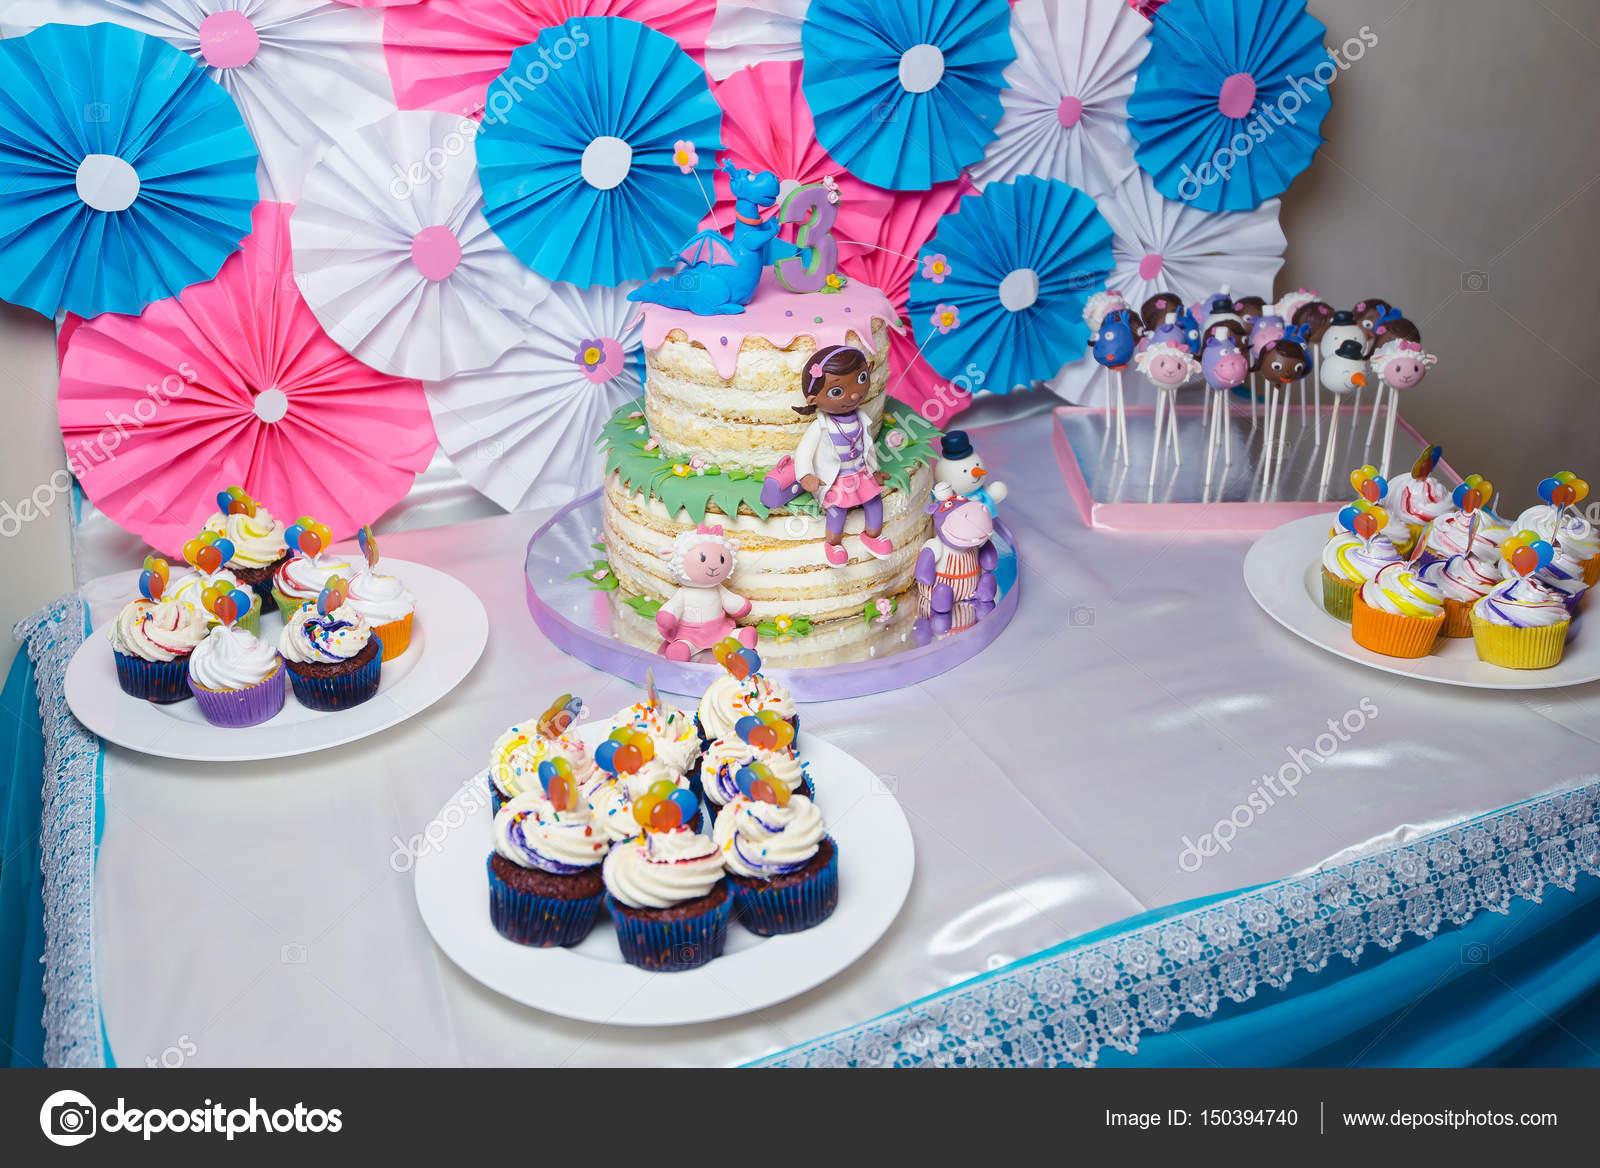 Mesa buffet decoraci n para cumplea os 3 a os foto de stock maxfoto87 150394740 - Decoracion cumpleanos anos ...